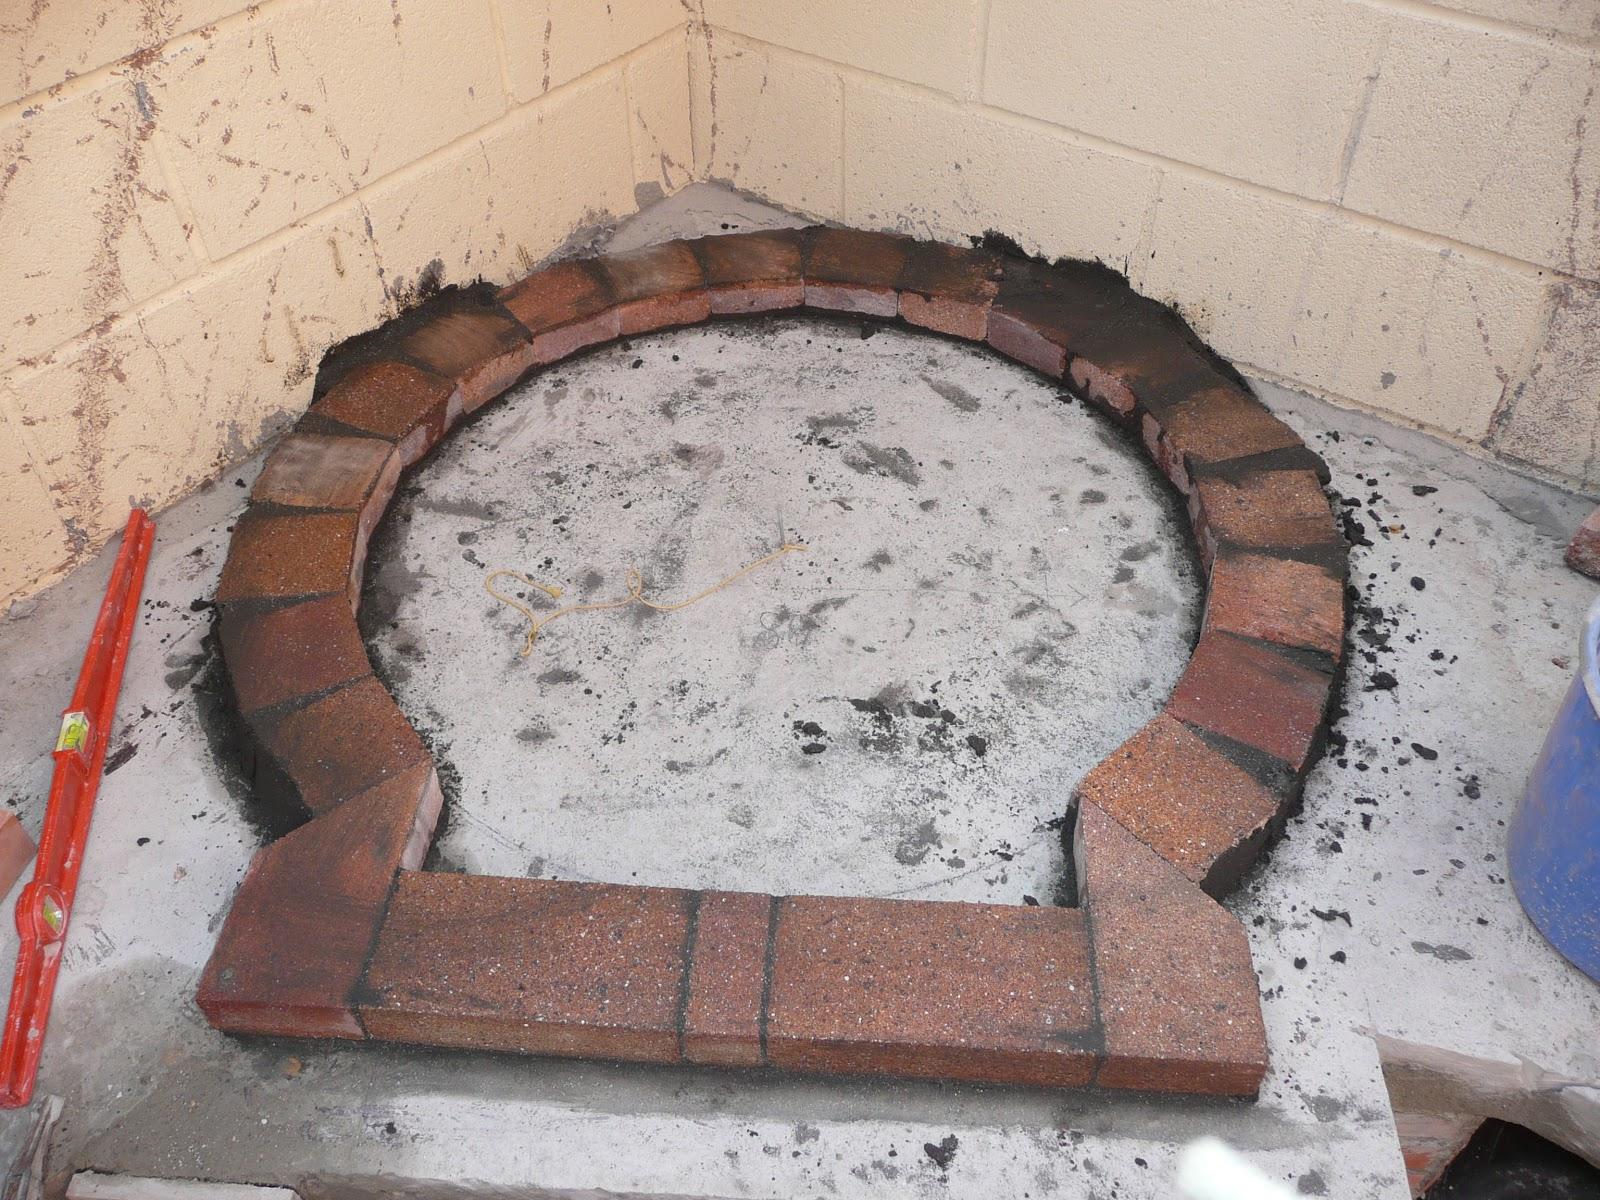 Recetas f ciles de josean mg replanteo del horno con fotos - Como fabricar horno de lena ...